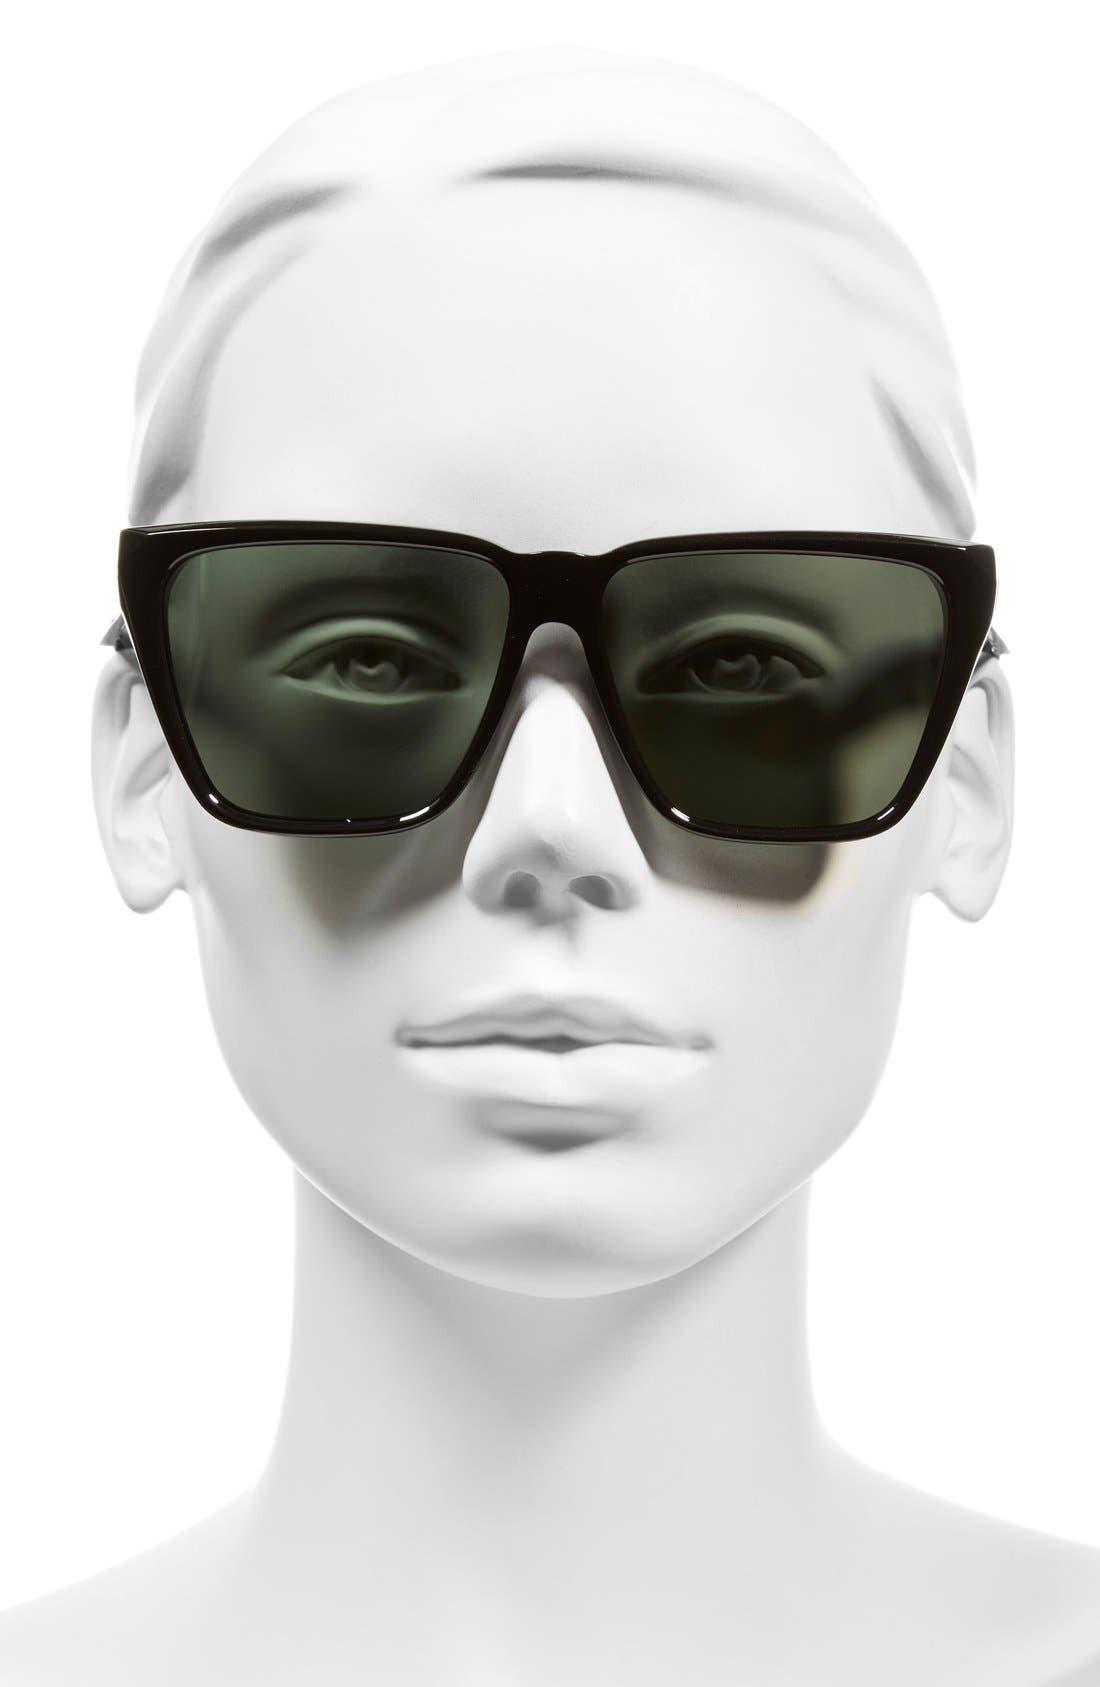 58mm Flat Top Sunglasses,                             Alternate thumbnail 2, color,                             Black/ Grey Green